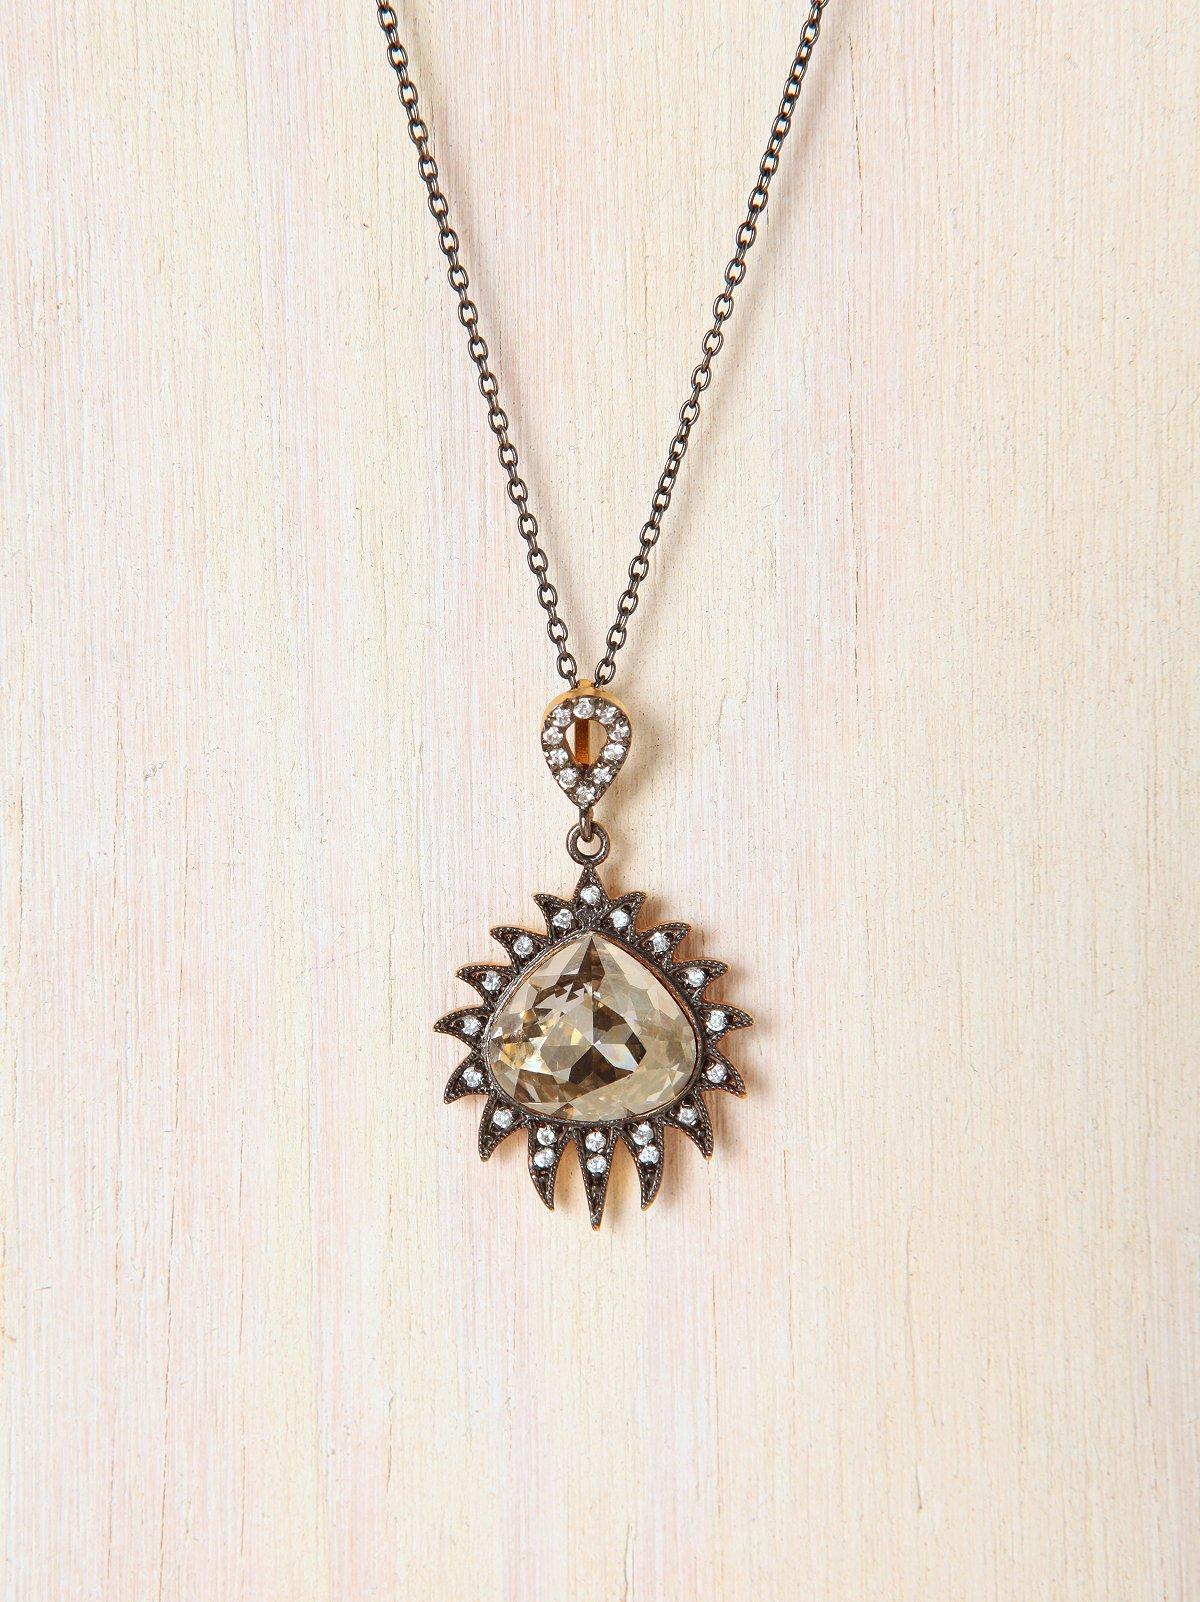 Claw Drop Necklace